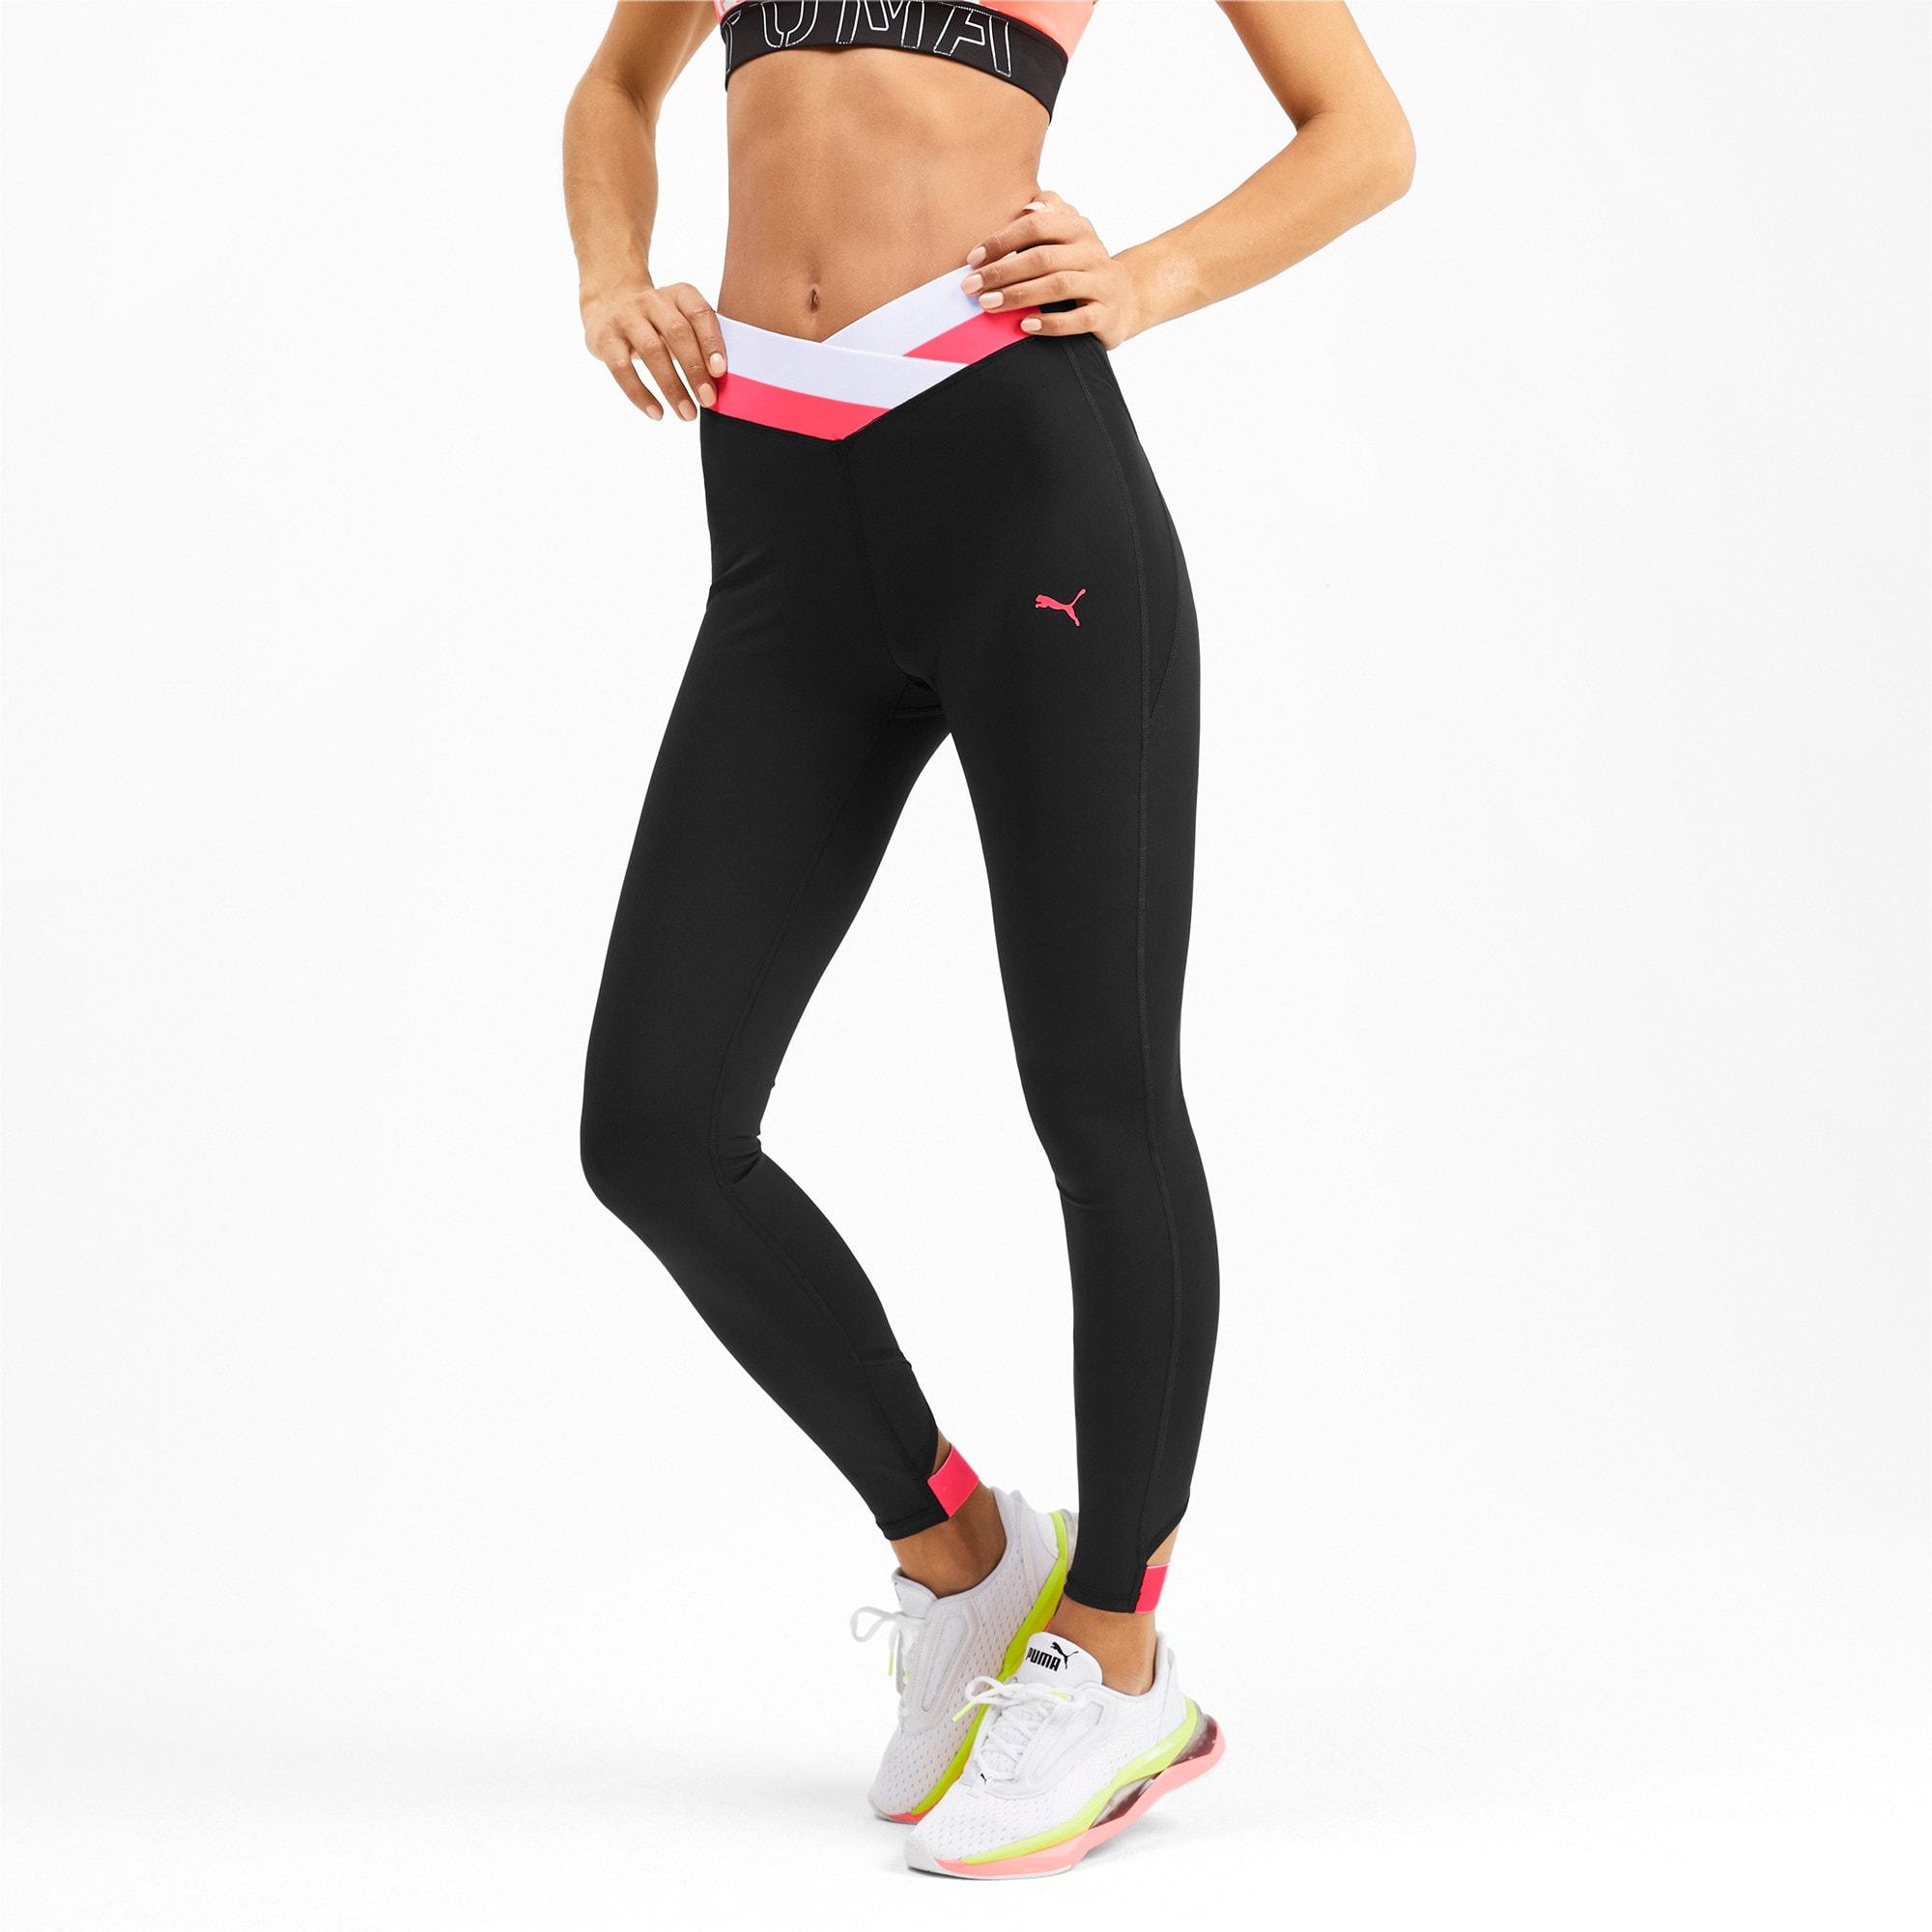 Thumbnail 1 of HIT Feel It 7/8 Women's Training Leggings, Puma Black-Pink Alert, medium